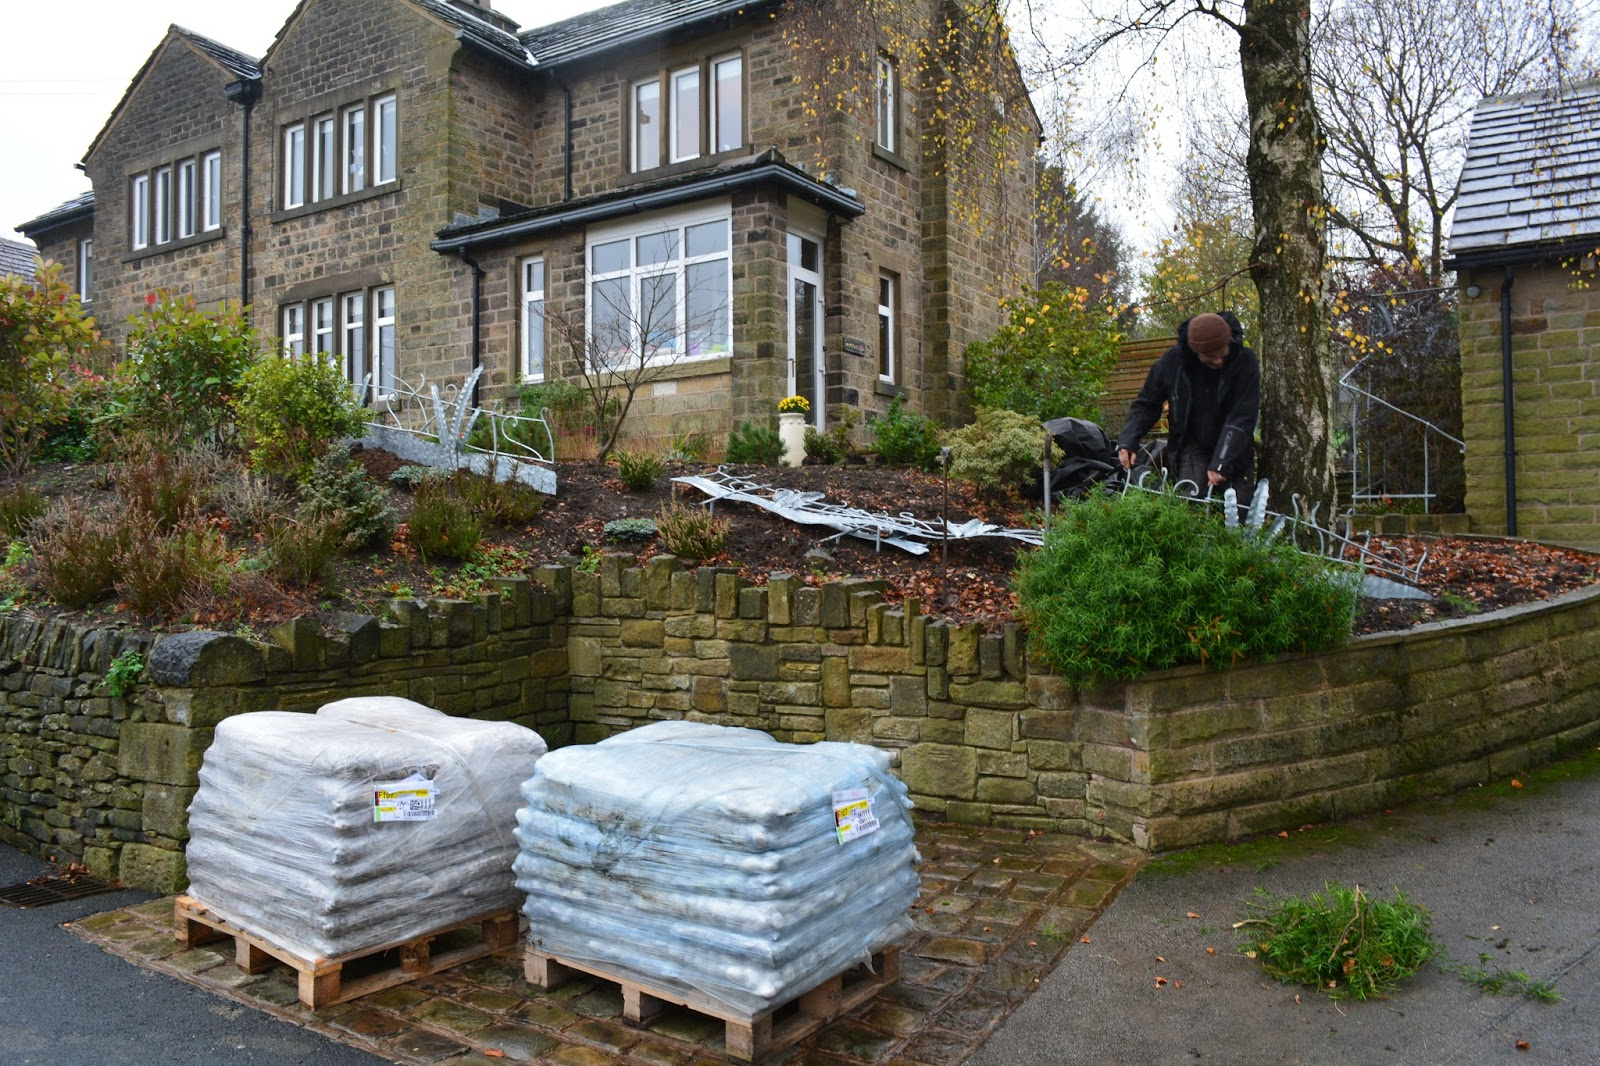 David Keegans Garden Design Blog: Dry River Cobble and Dwarf Pine ...